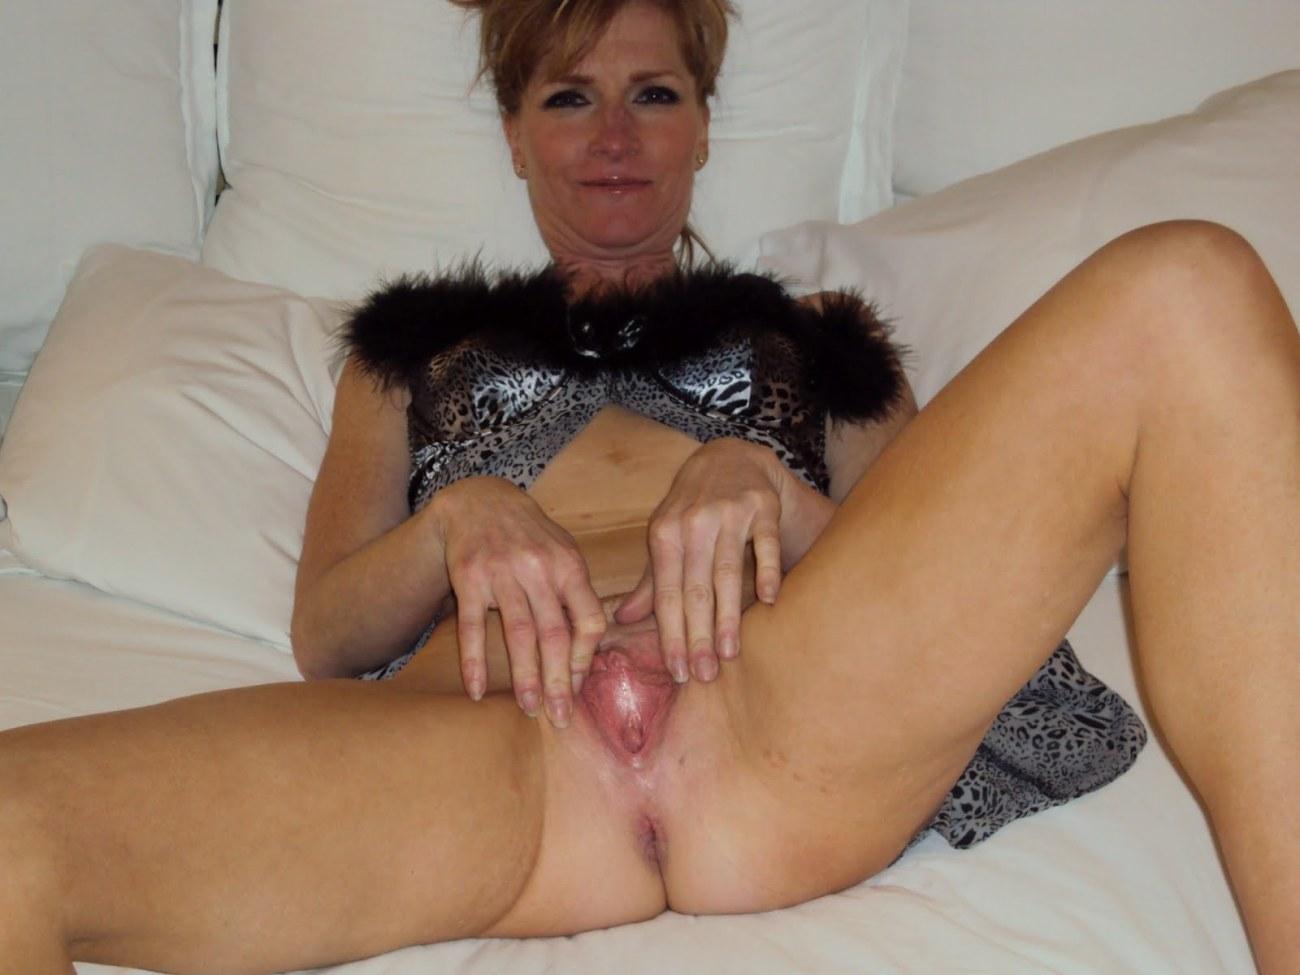 Shaven wifey cooch rubdown my rod -..